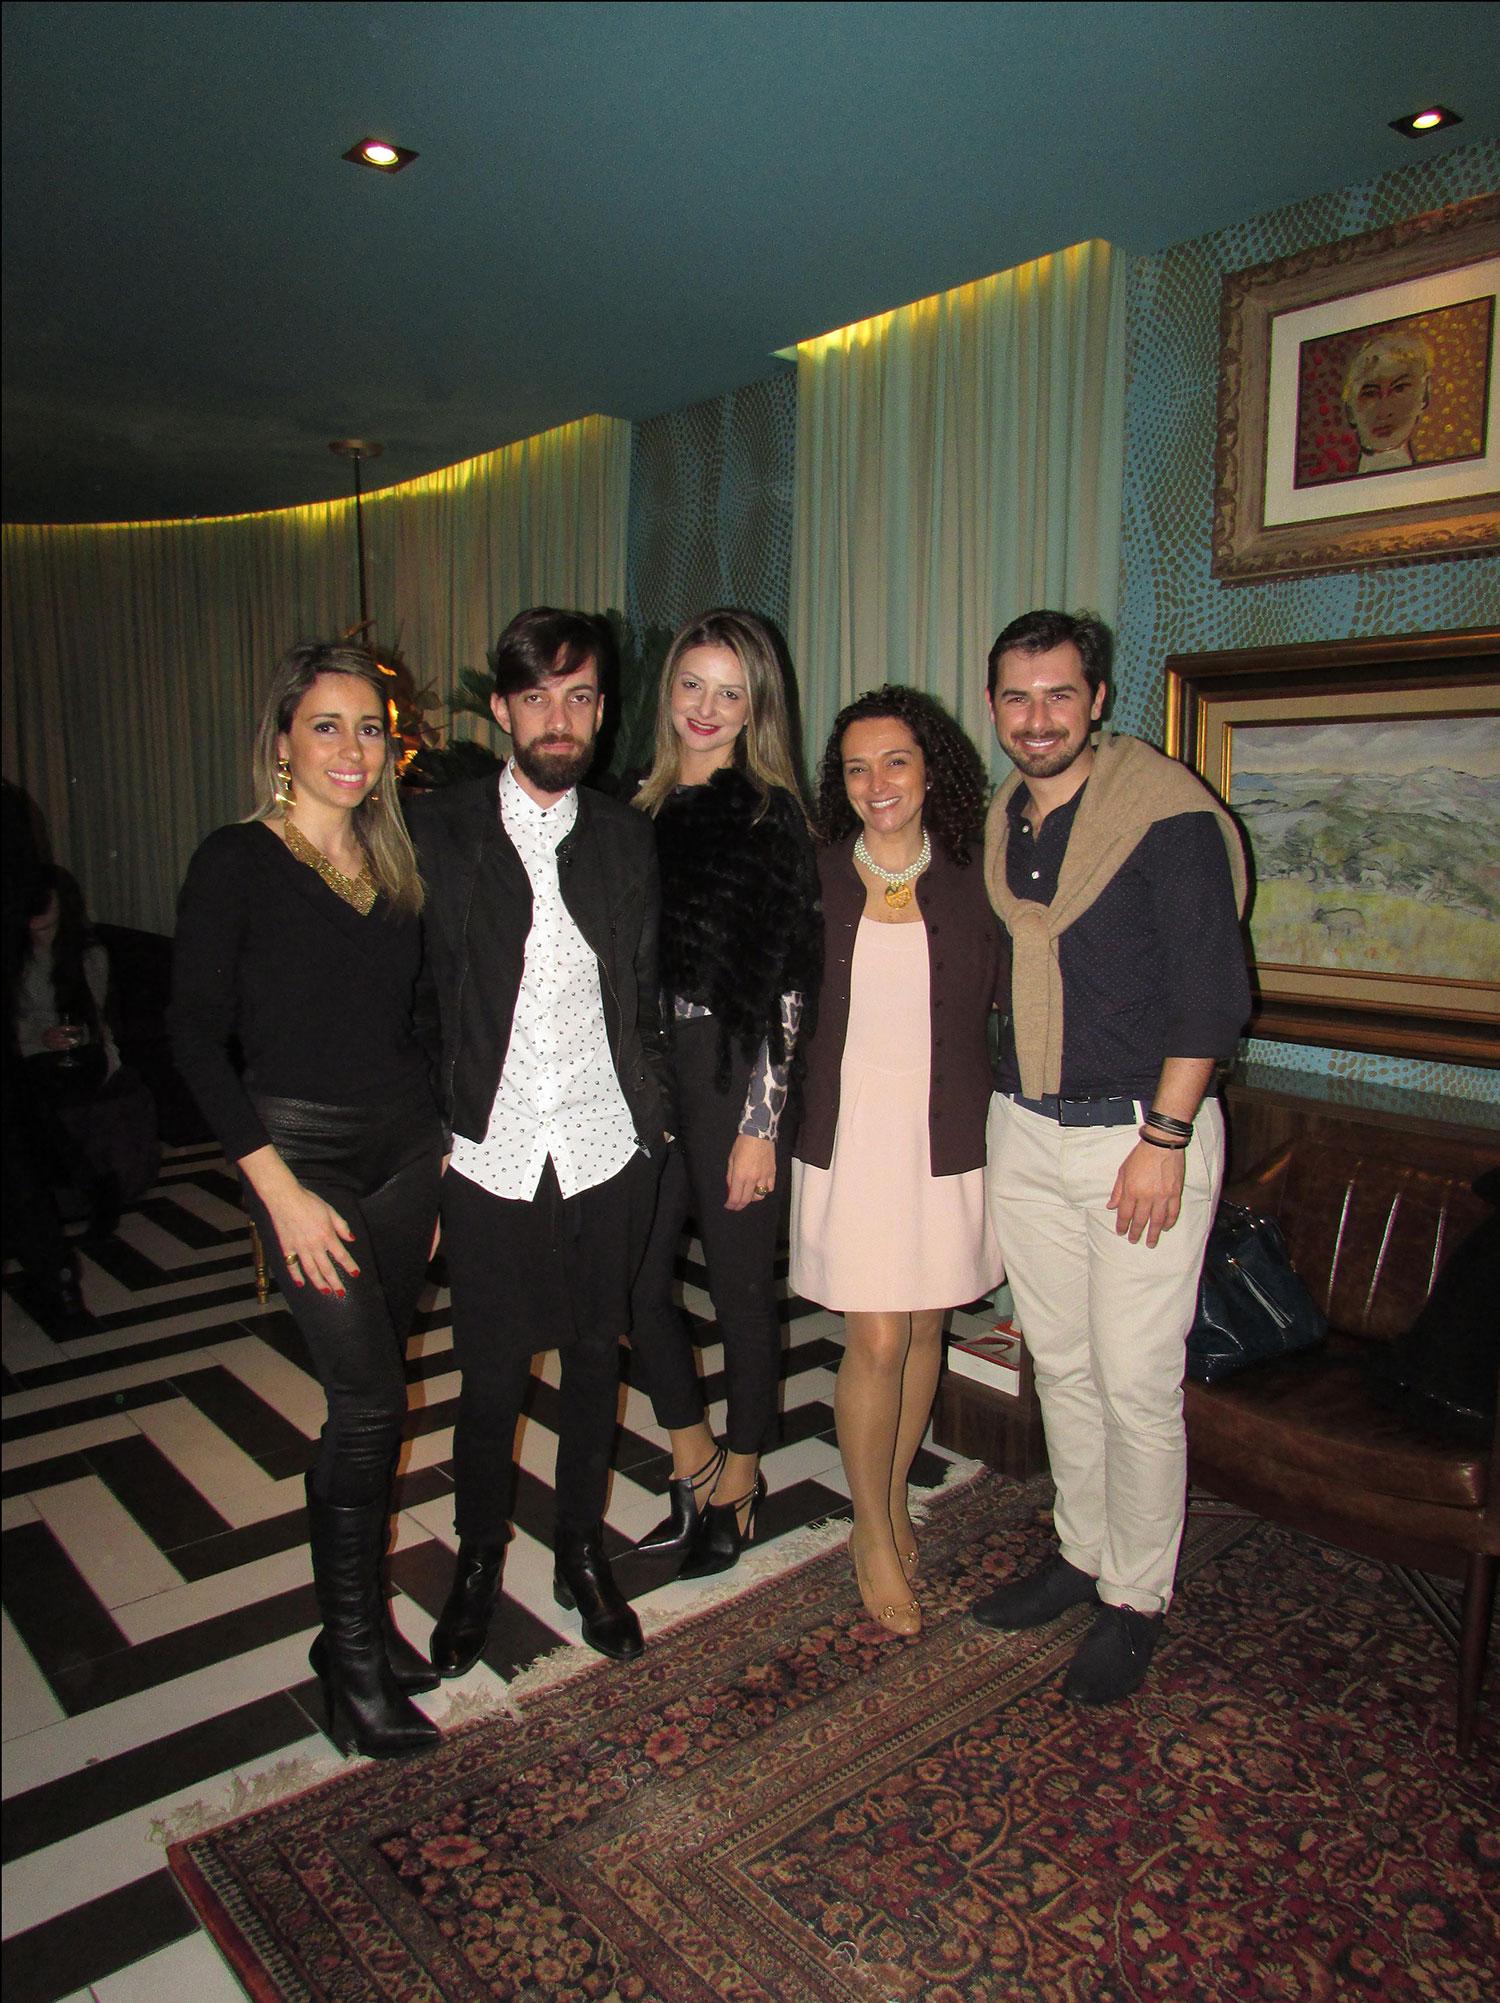 Karina-Capaverde,-Juca-Cruz,Cris-da-Luz,-Anna-Belle-e-Ricardo-Caviochioni